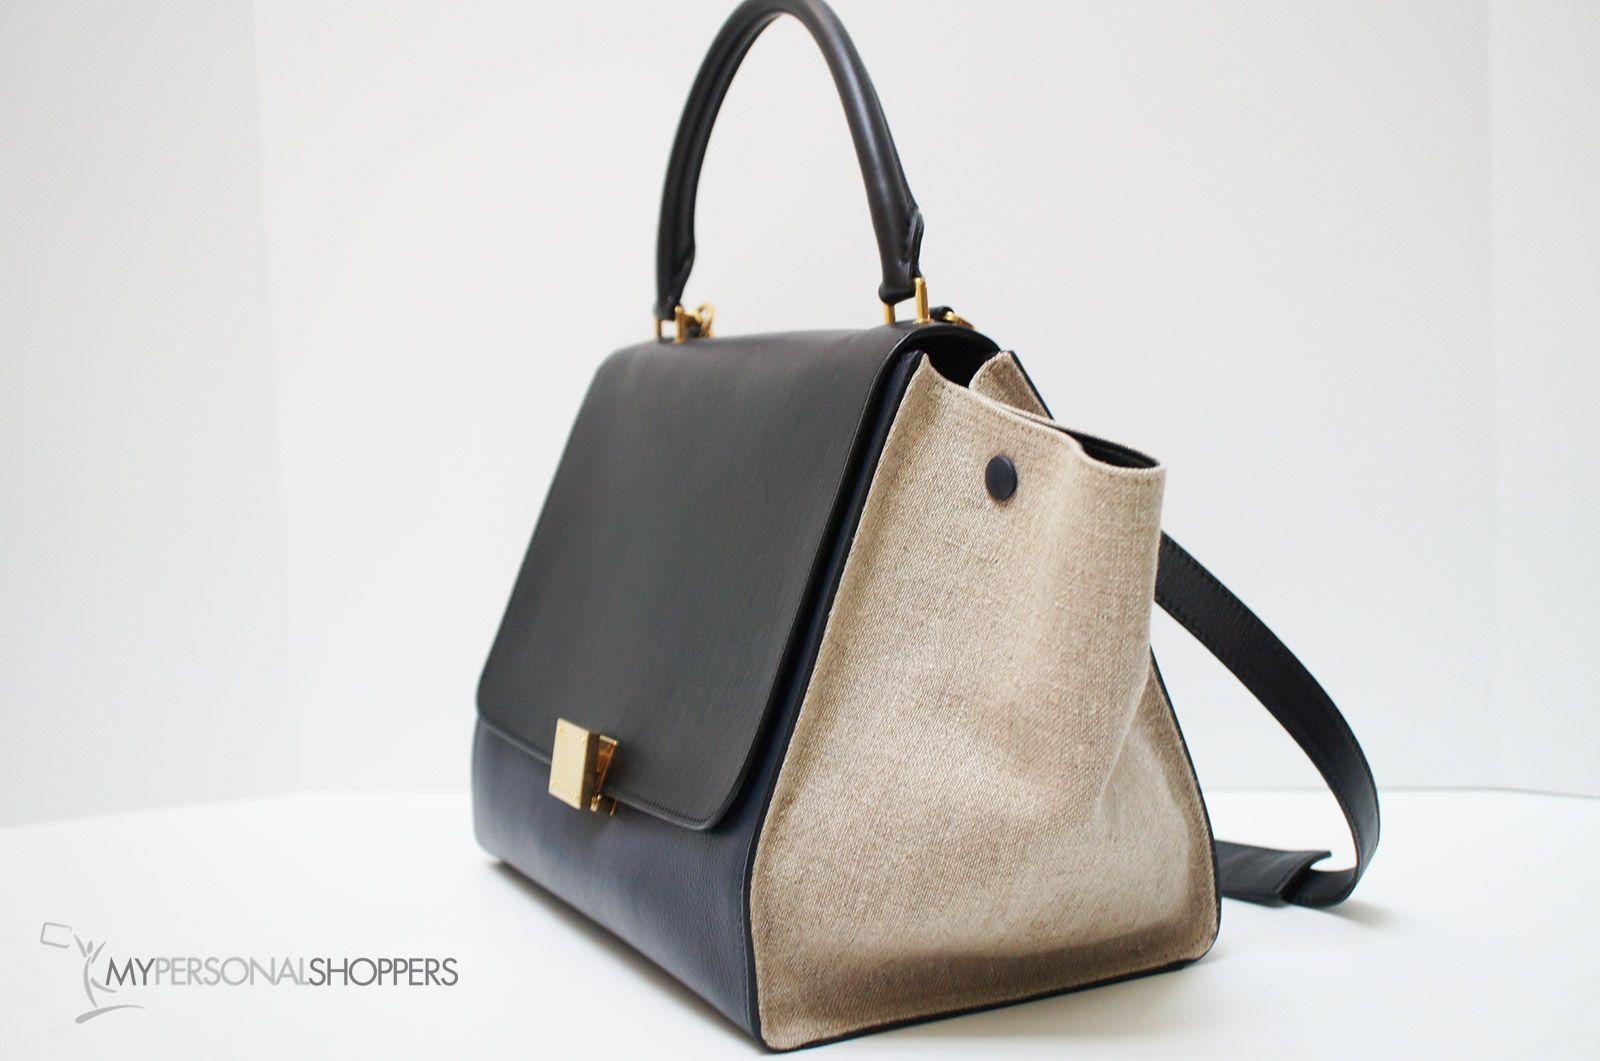 Celine Tri-Color Black Navy Leather Beige Canvas Sides Trapeze Satchel Bag